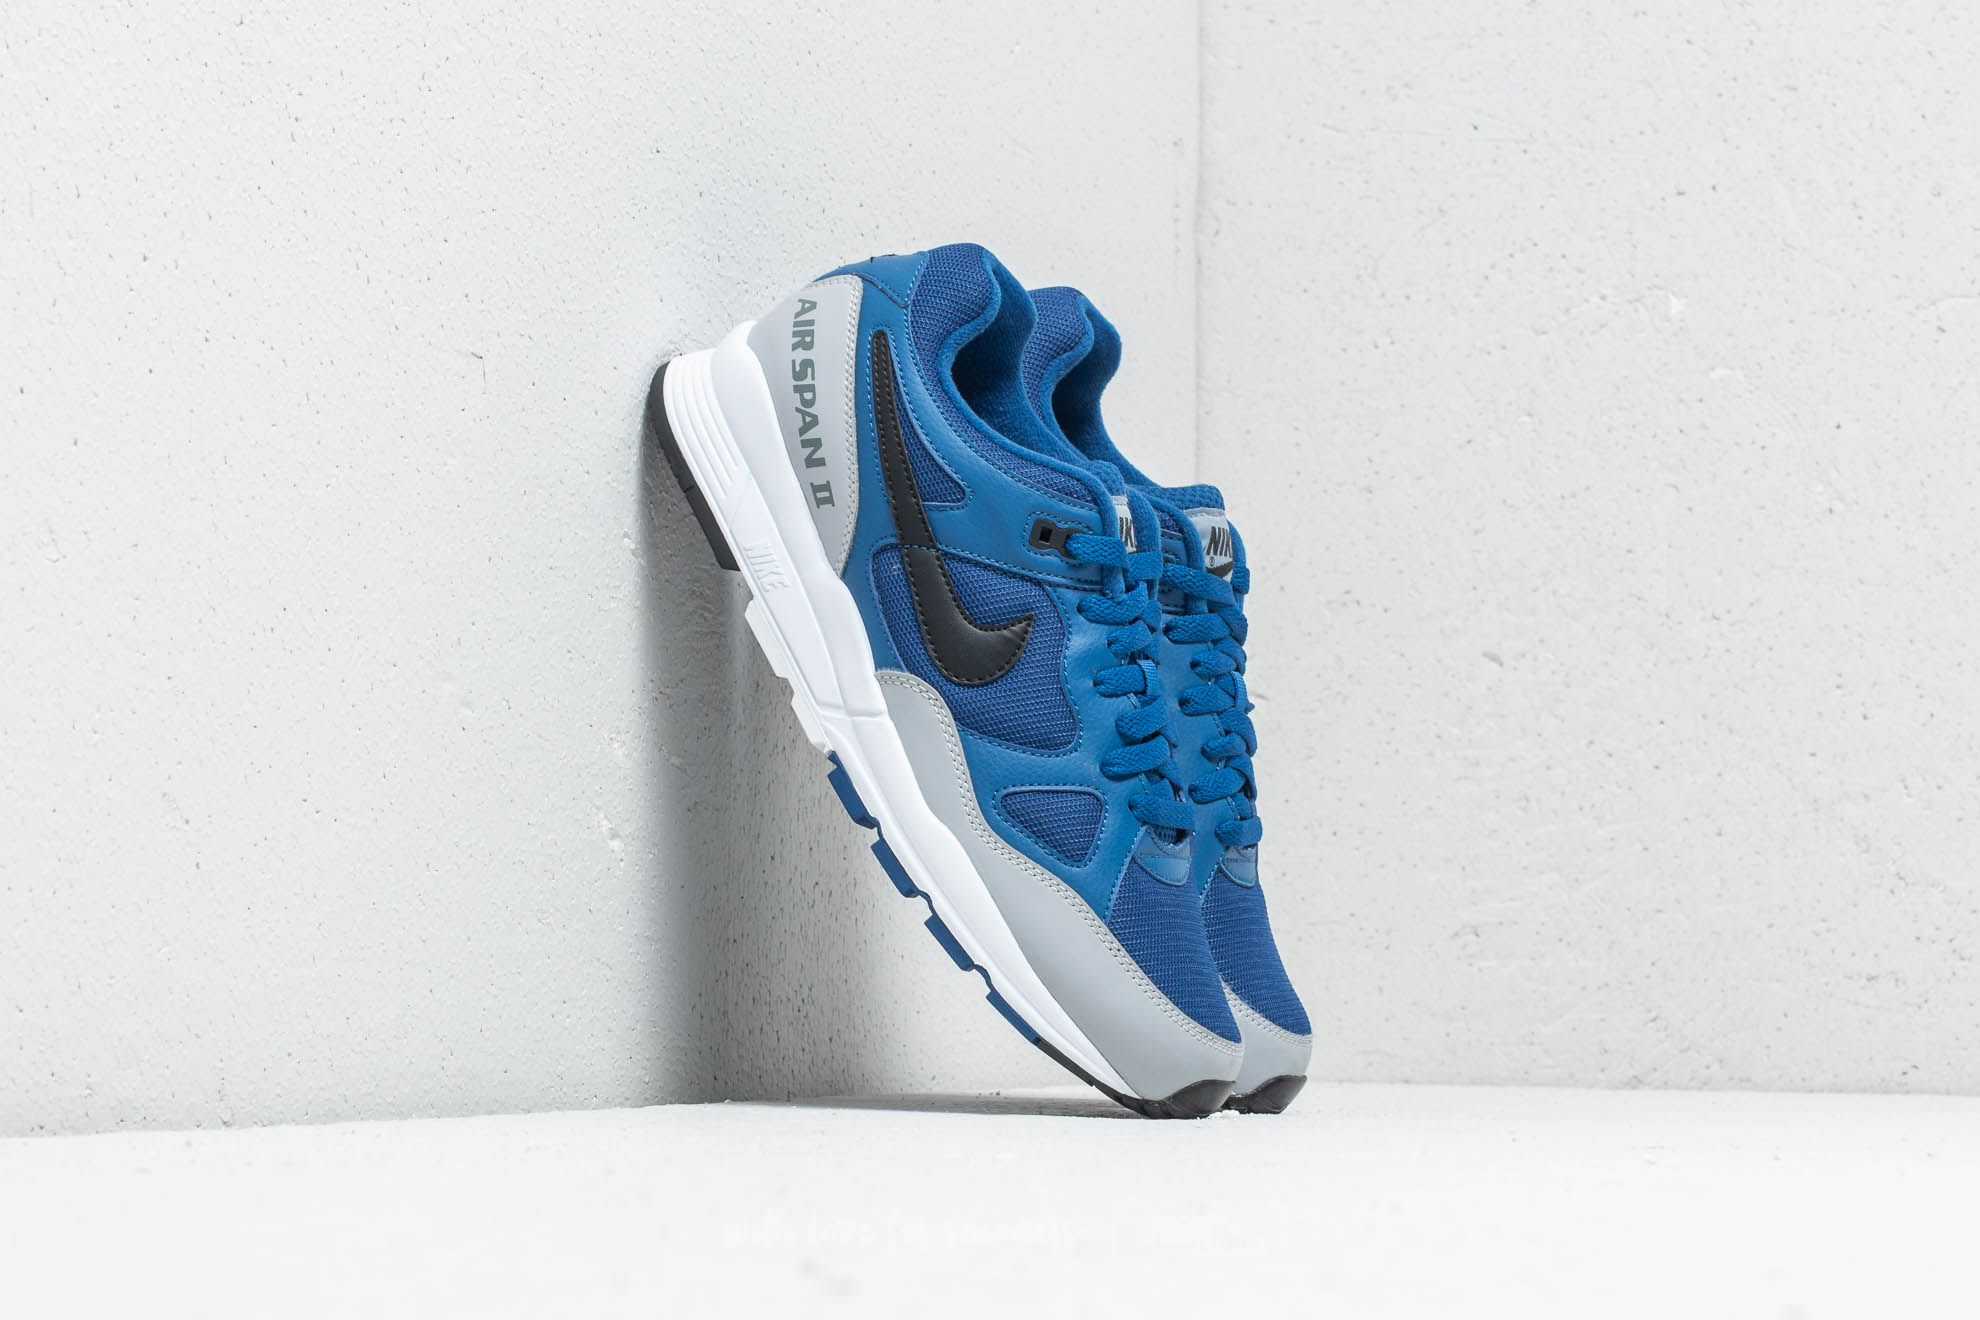 Nike W Air Span II Gym Blue/ Black-Wolf Grey za skvělou cenu 2 690 Kč koupíte na Footshop.cz